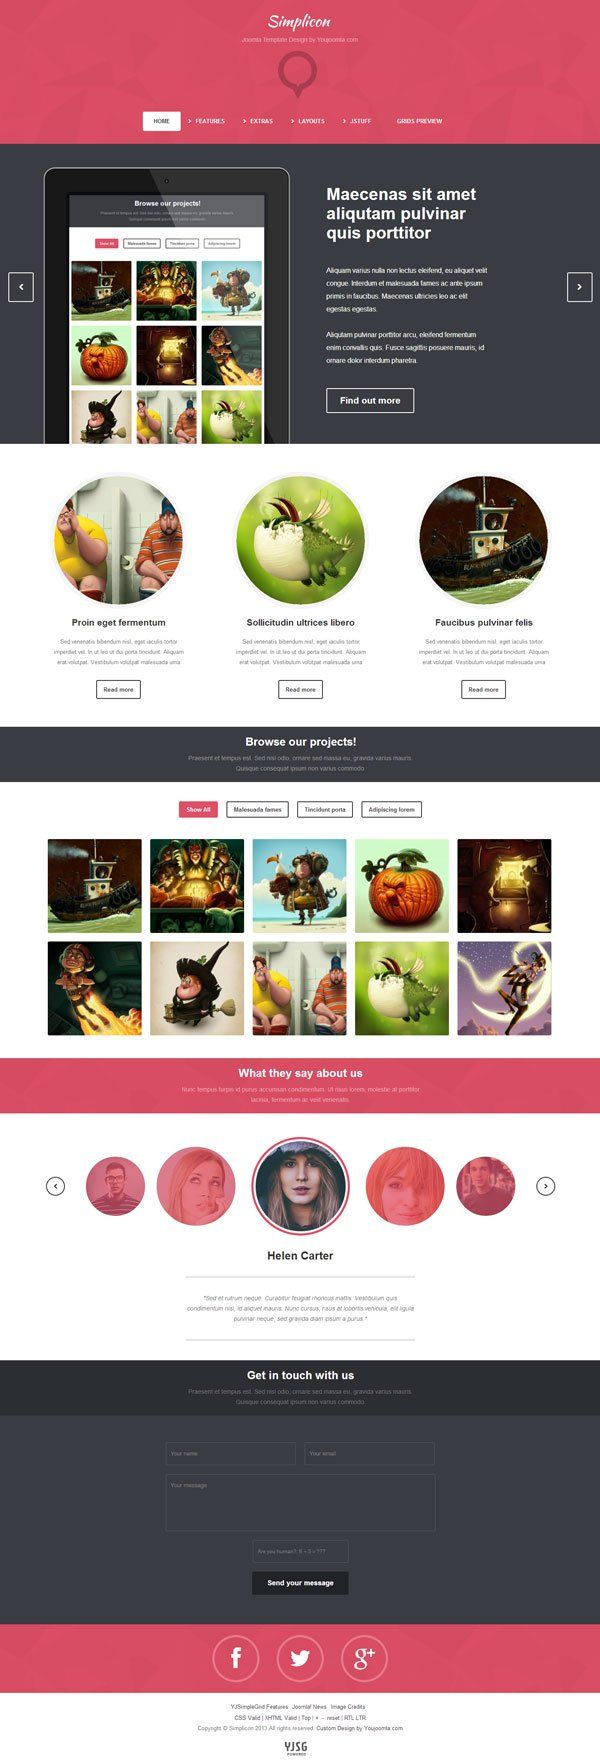 Portfolio Design Template | Simplicon Joomla Web Designer Portfolio Template Joomla Templates